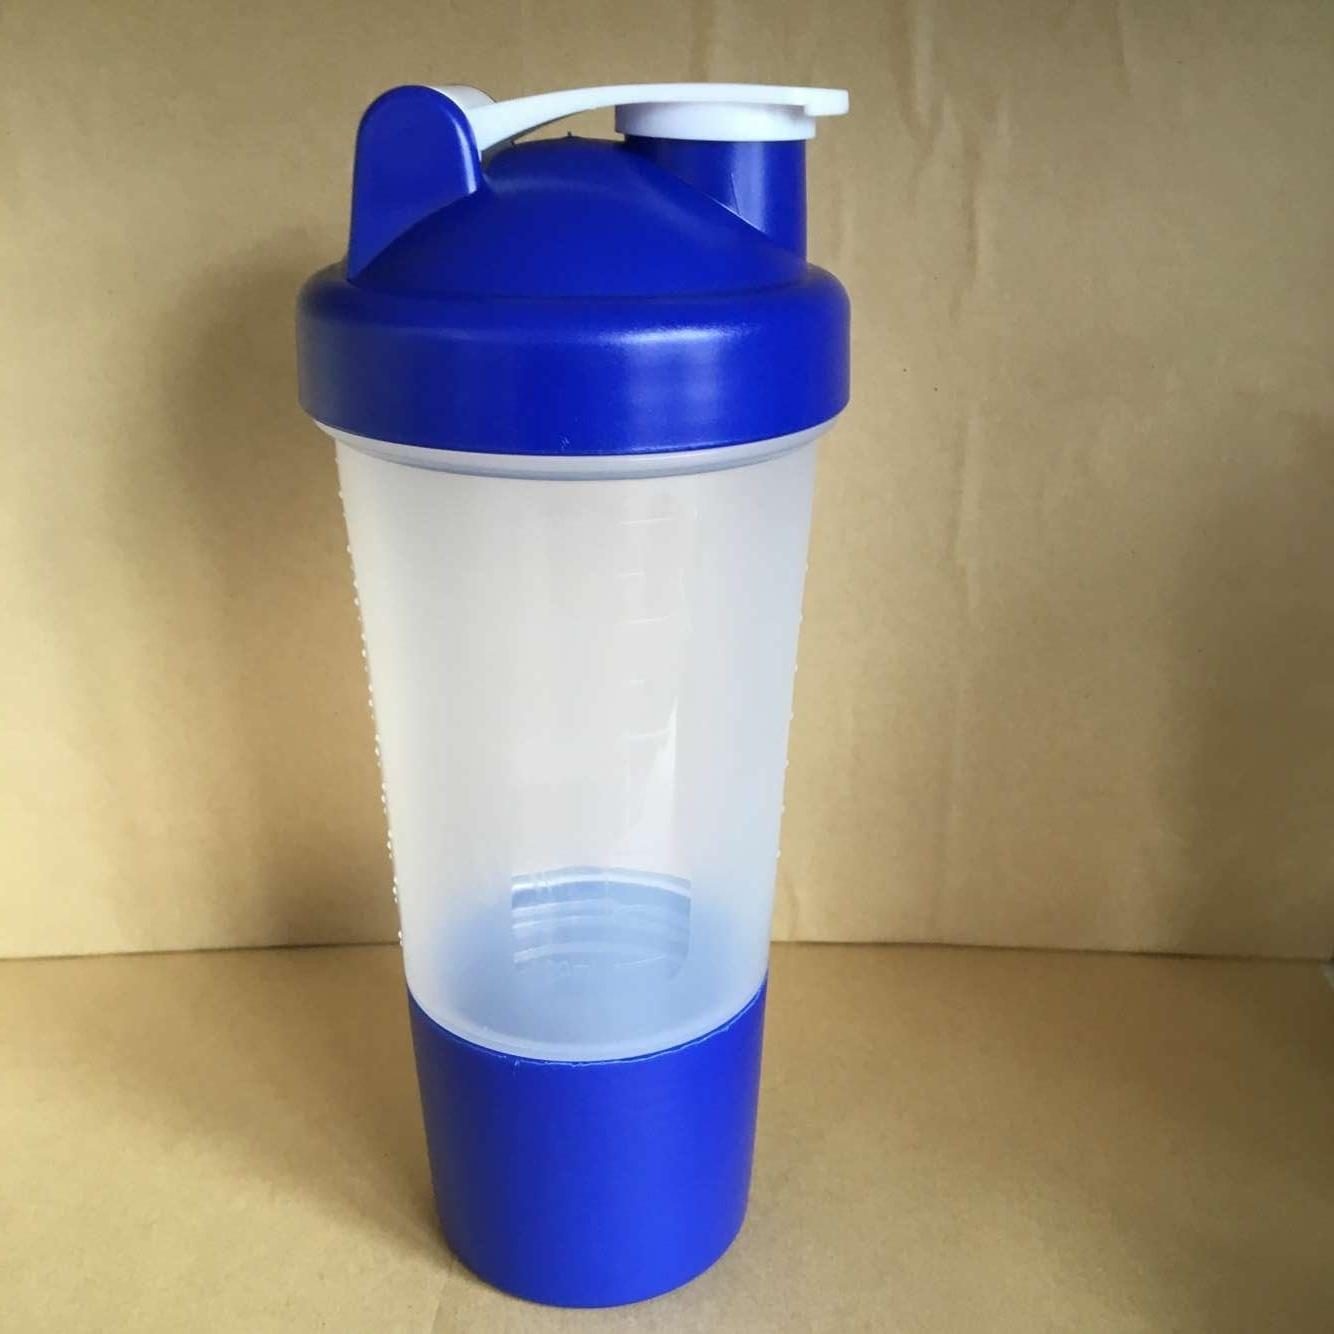 500ml BPA Free Plastic Protein Shaker Bottle 2-in-1